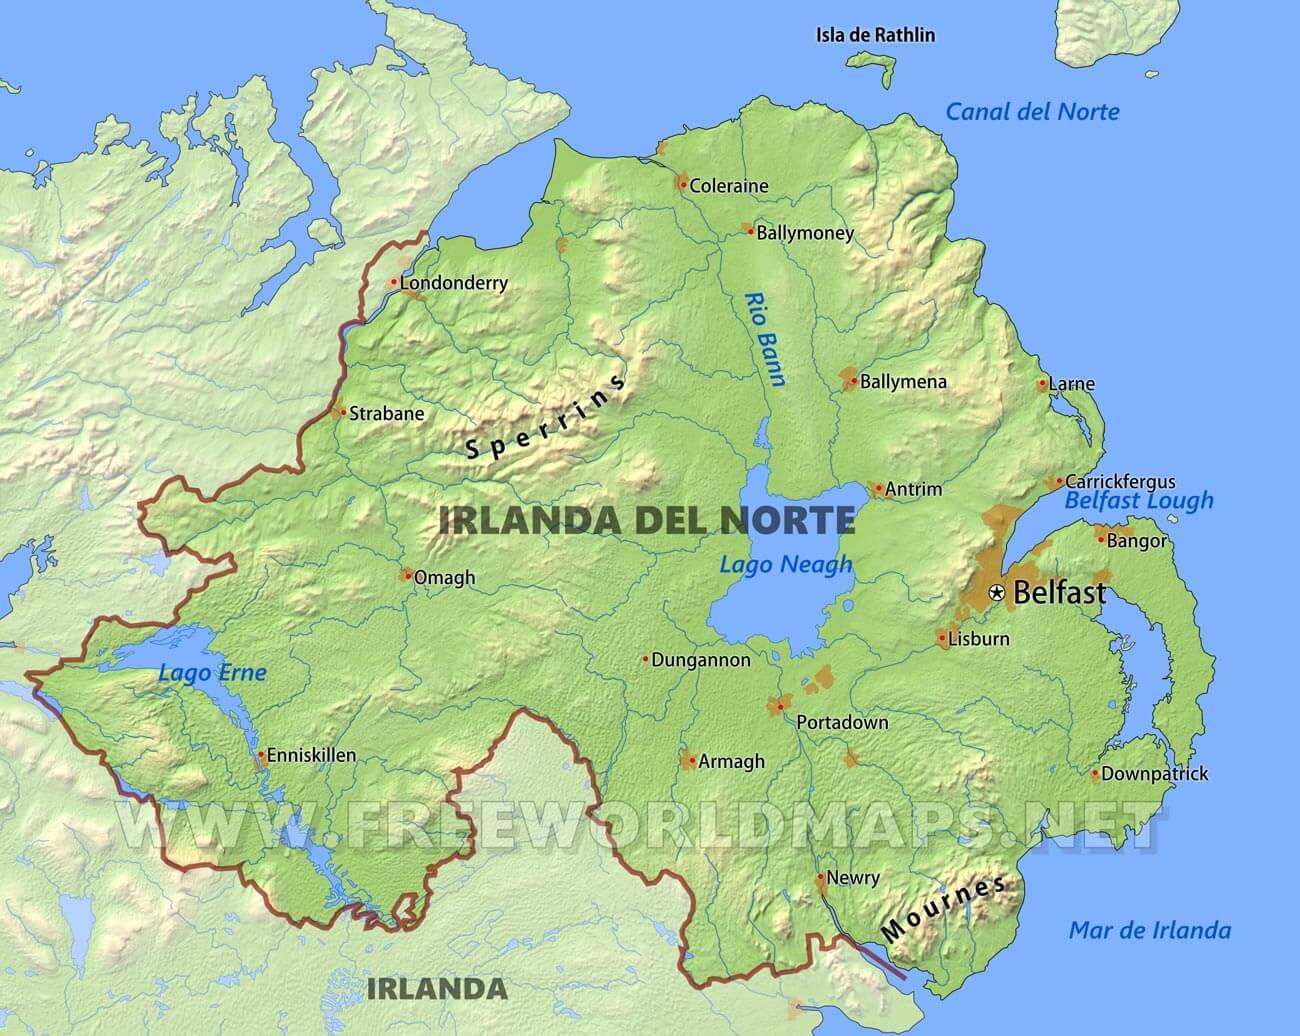 Mapa Irlanda Del Norte.Mapa De Irlanda Del Norte